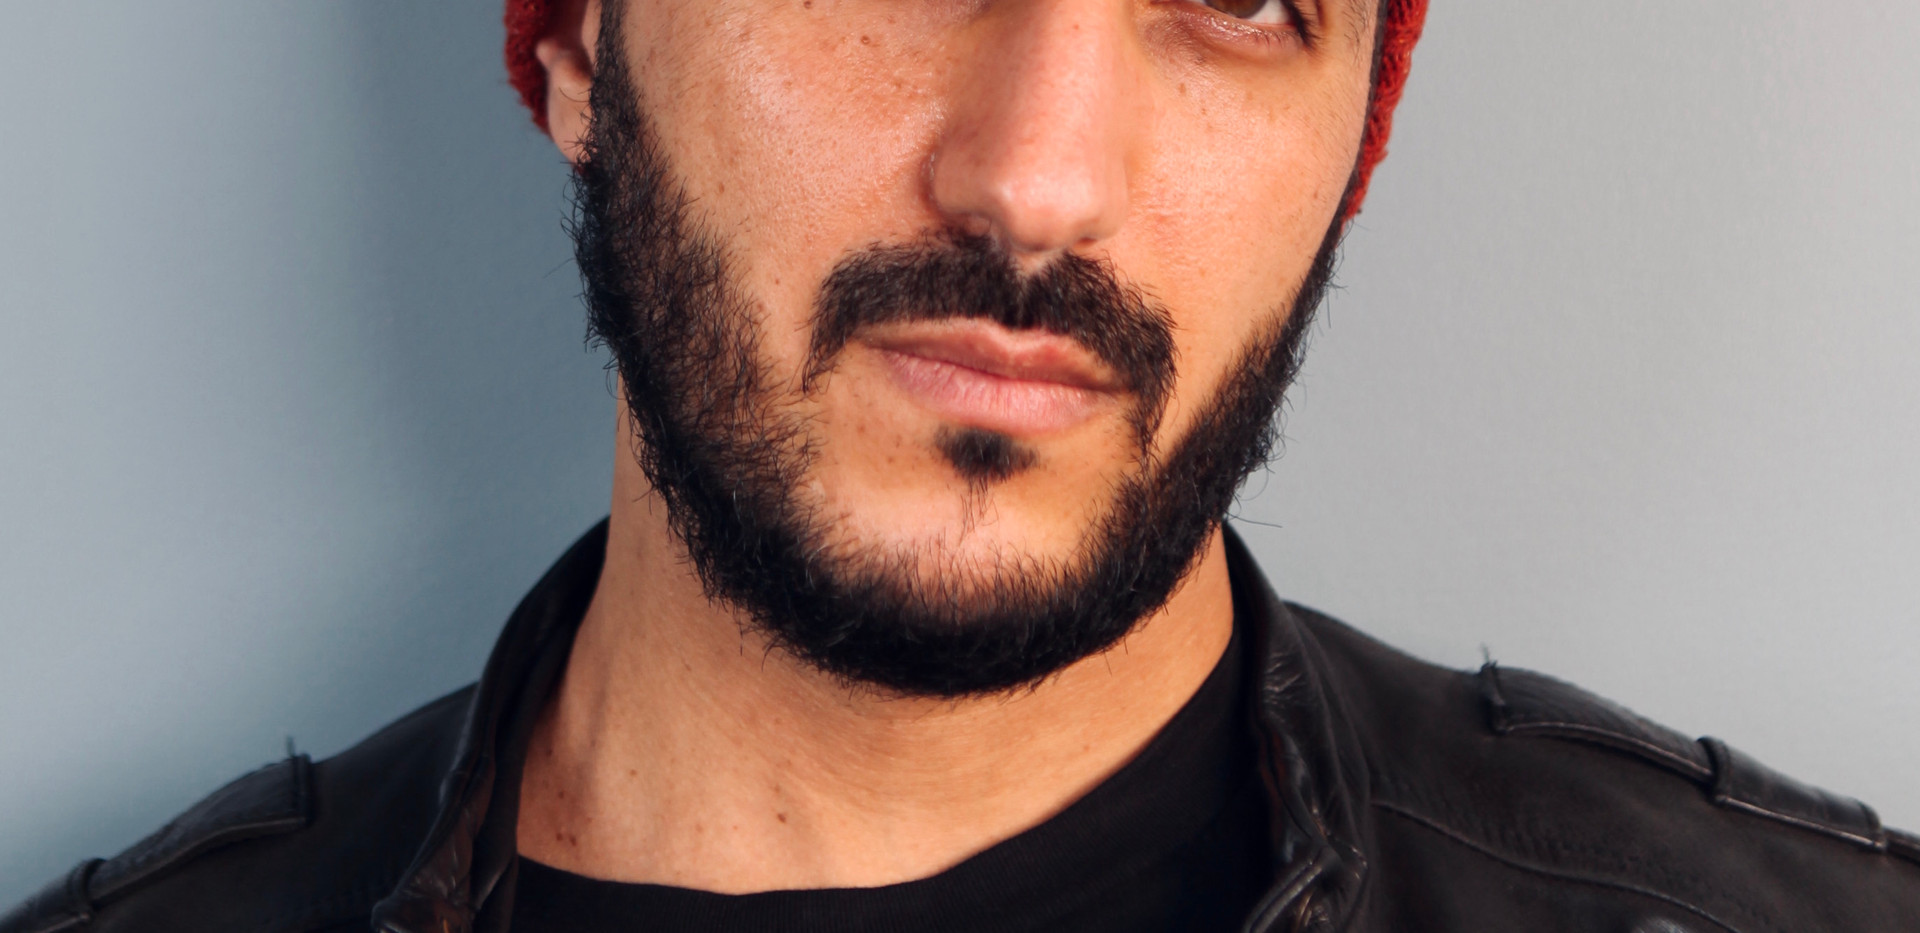 Fouad hachani